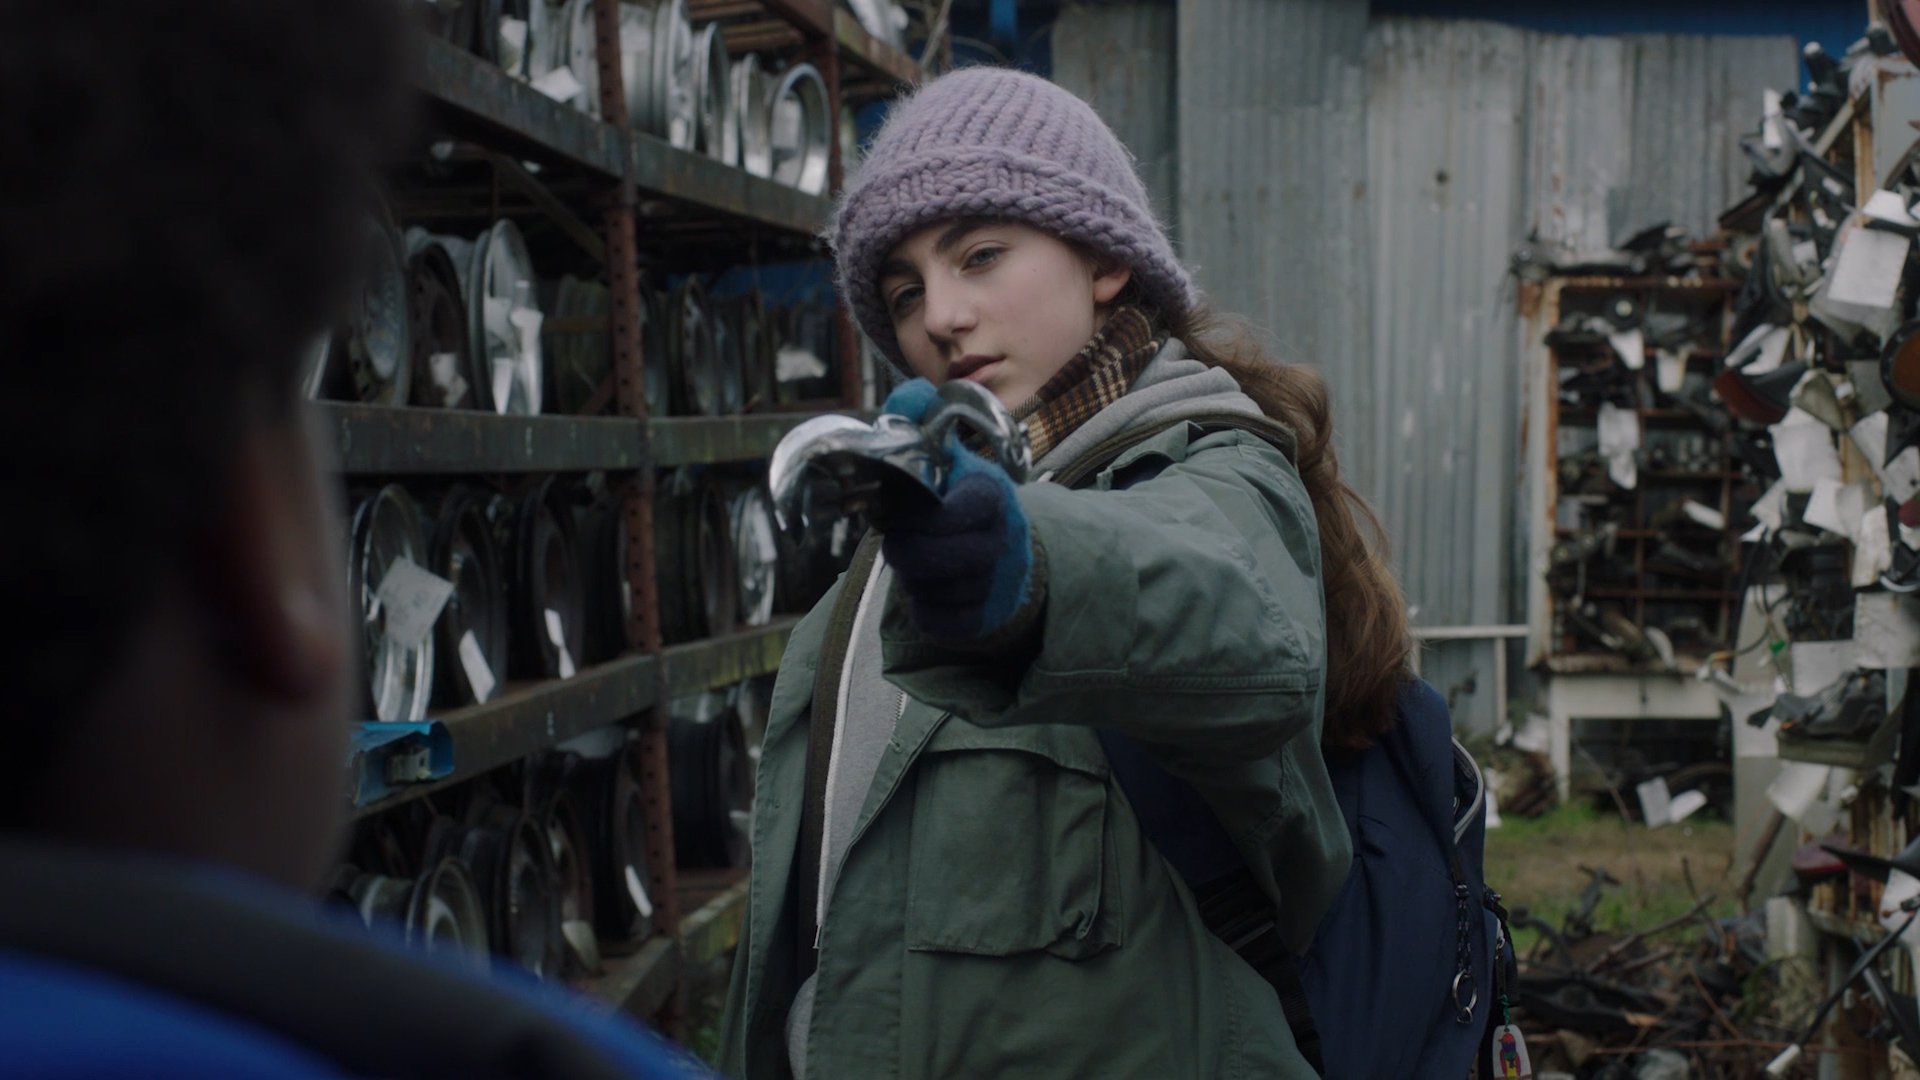 Sophia Mitri Schloss as 'Sadie' and Keith L. Williams as 'Francis'